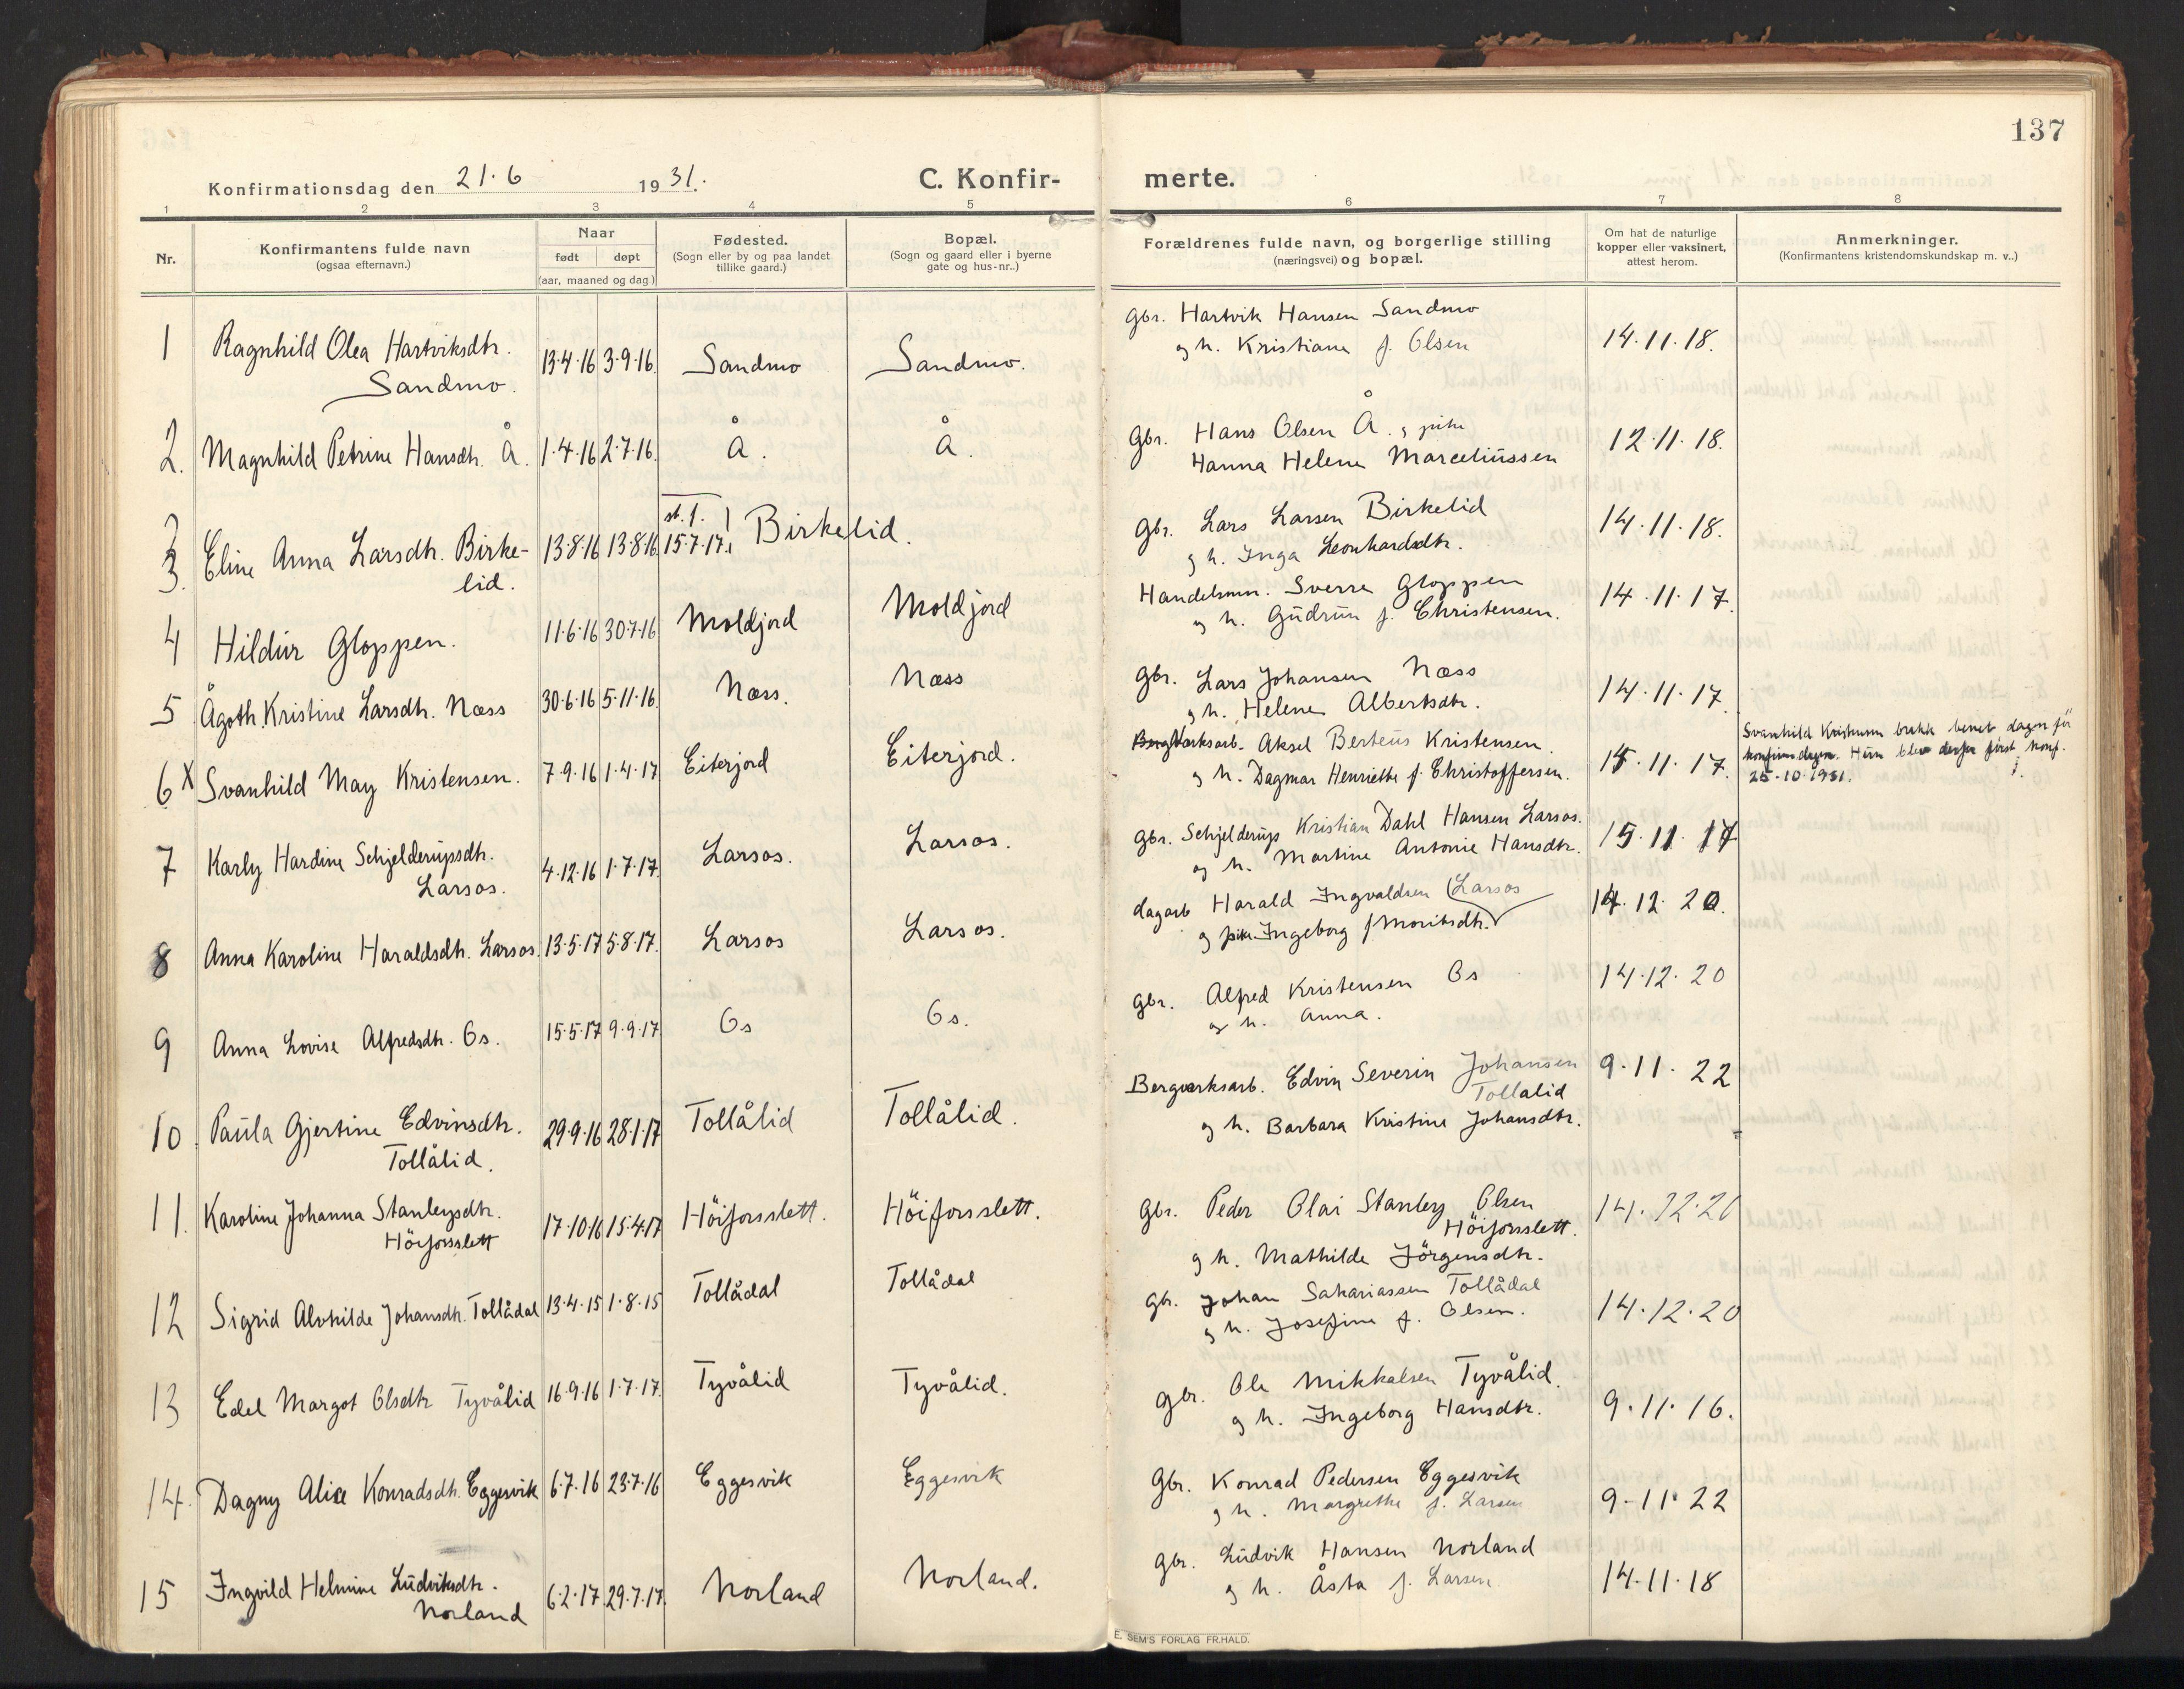 SAT, Ministerialprotokoller, klokkerbøker og fødselsregistre - Nordland, 846/L0650: Ministerialbok nr. 846A08, 1916-1935, s. 137